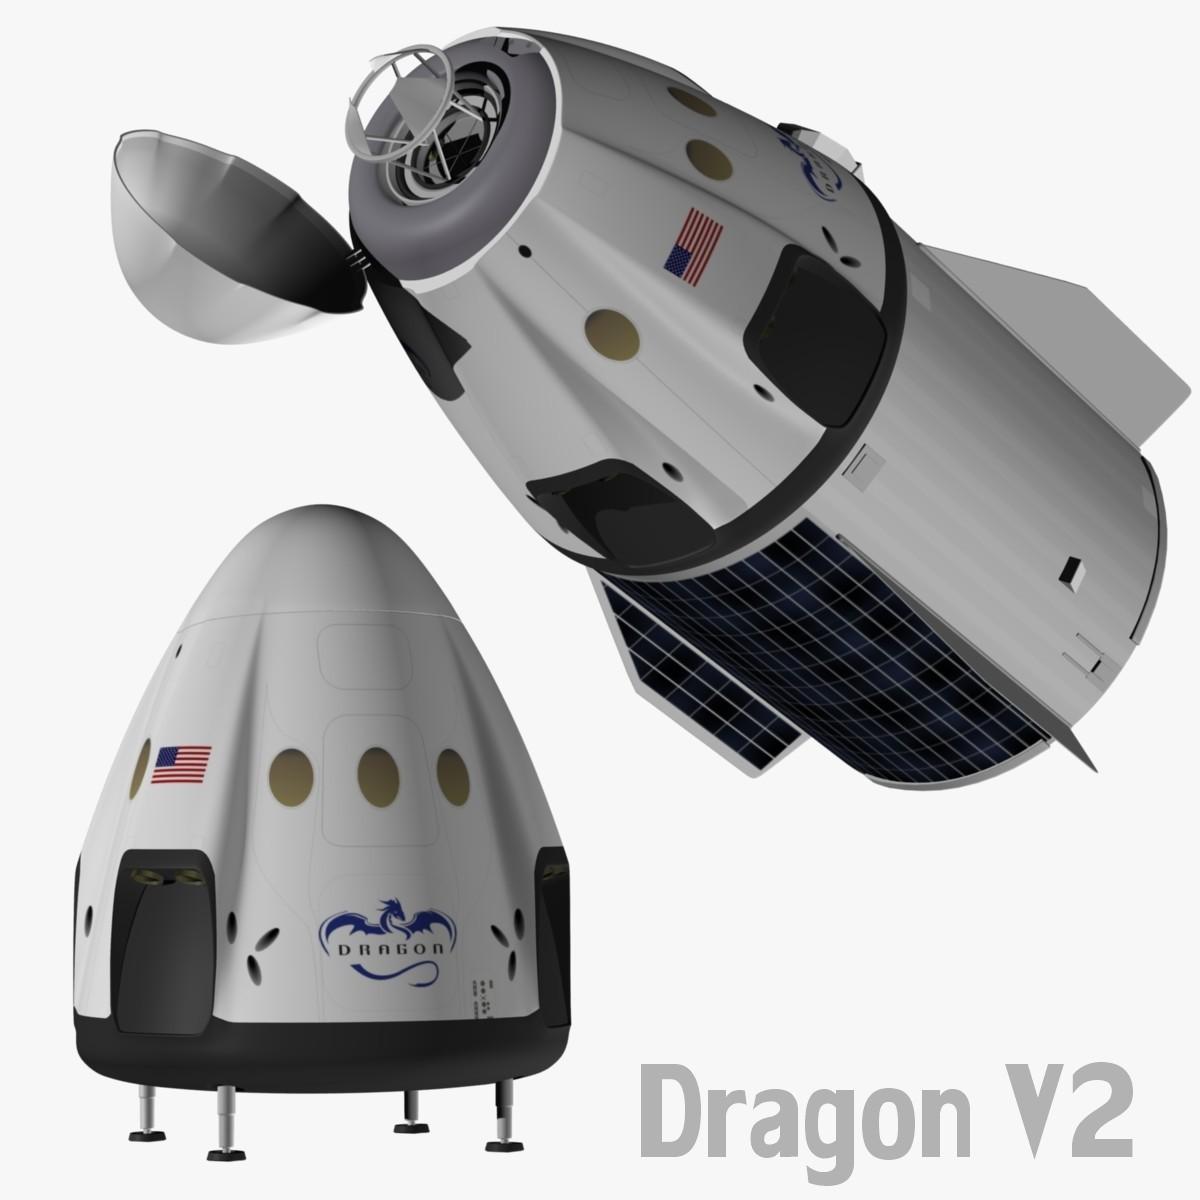 dragon spacecraft models - 800×800